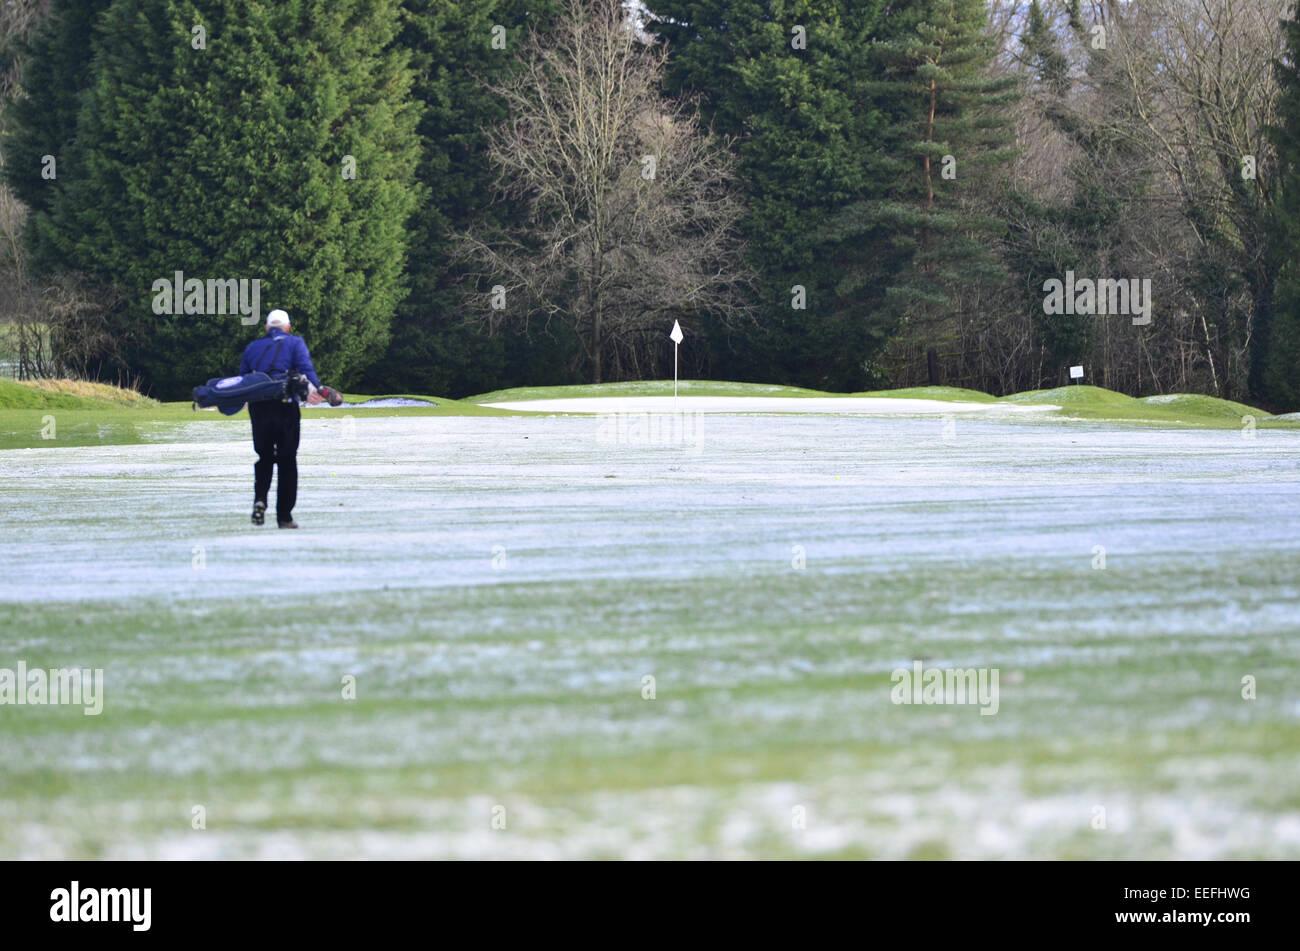 Bristol, UK. 17. Januar 2015. UK-Wetter. Mitglieder des langen Ashton Golf Club wo Spieler aller Altersklassen spielen Stockbild